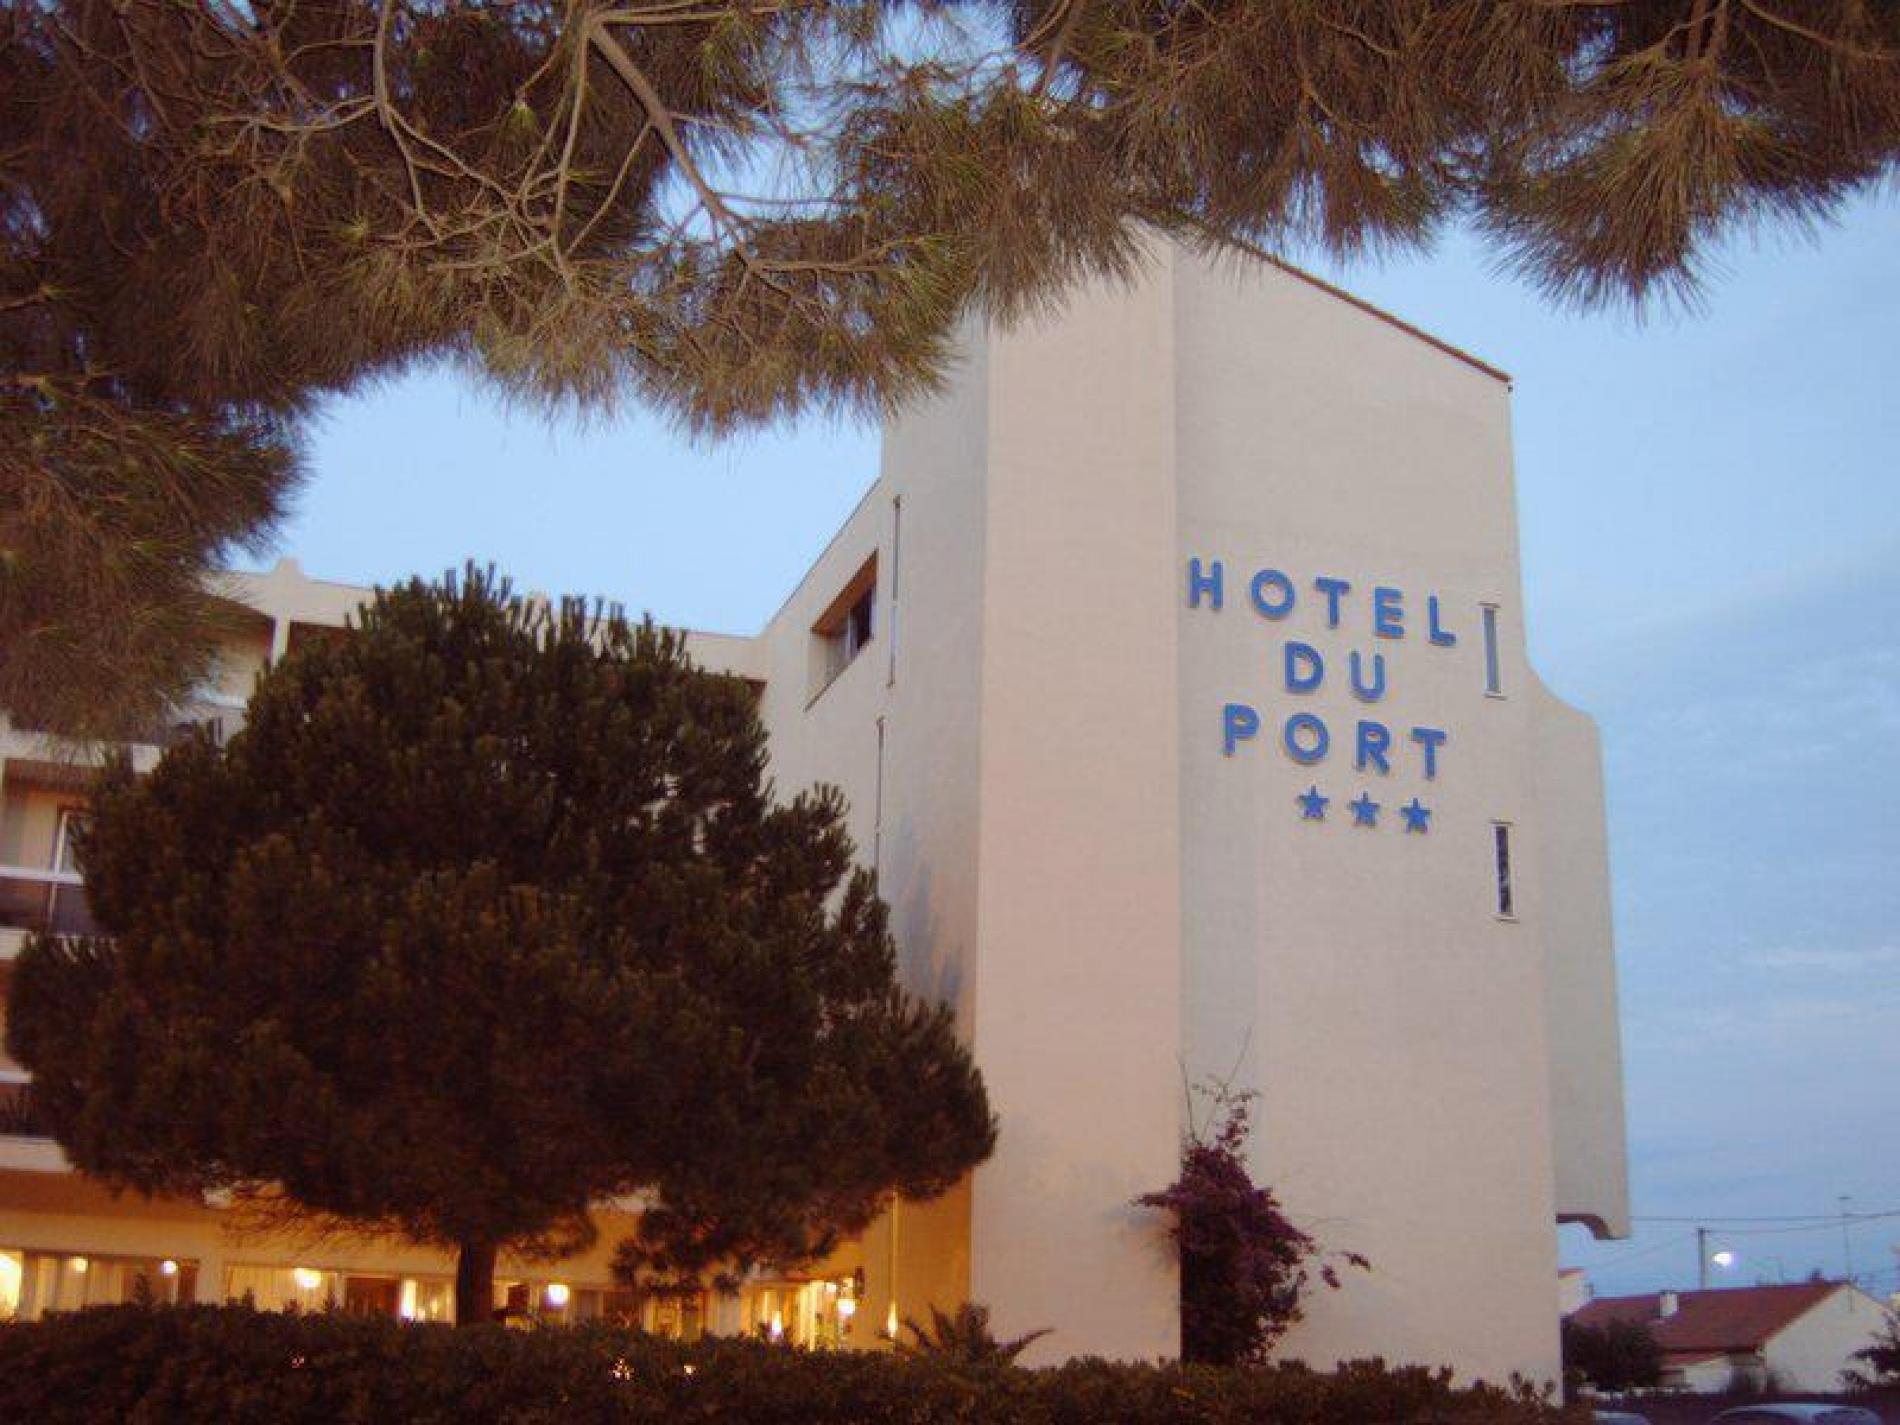 l'hotel le soir